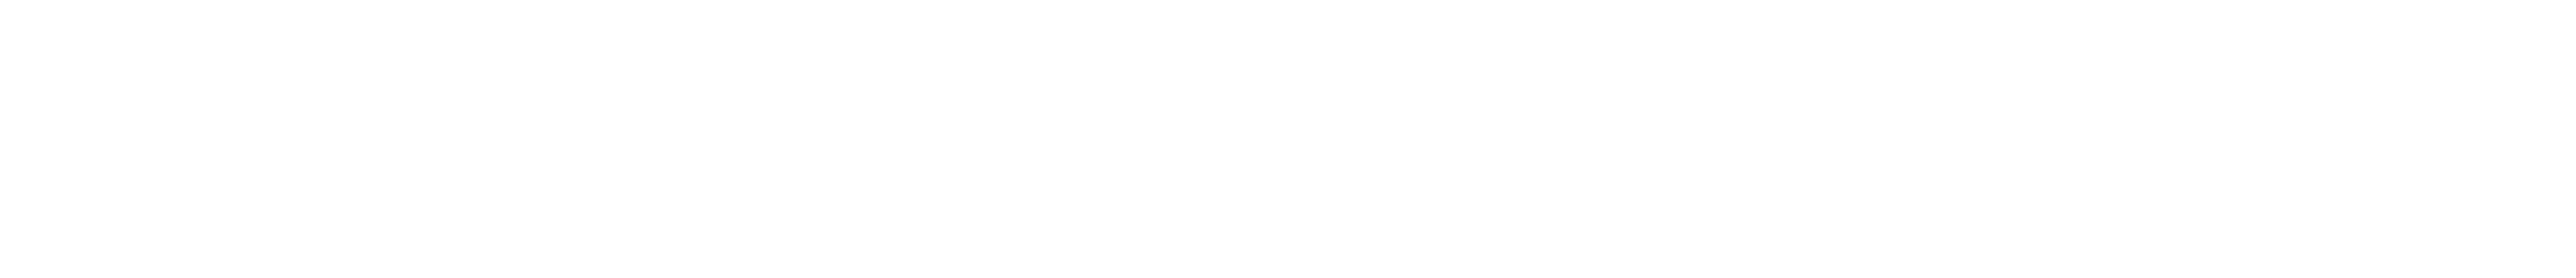 John Axelsen, Liberal Alliance, Politik og mærkesager